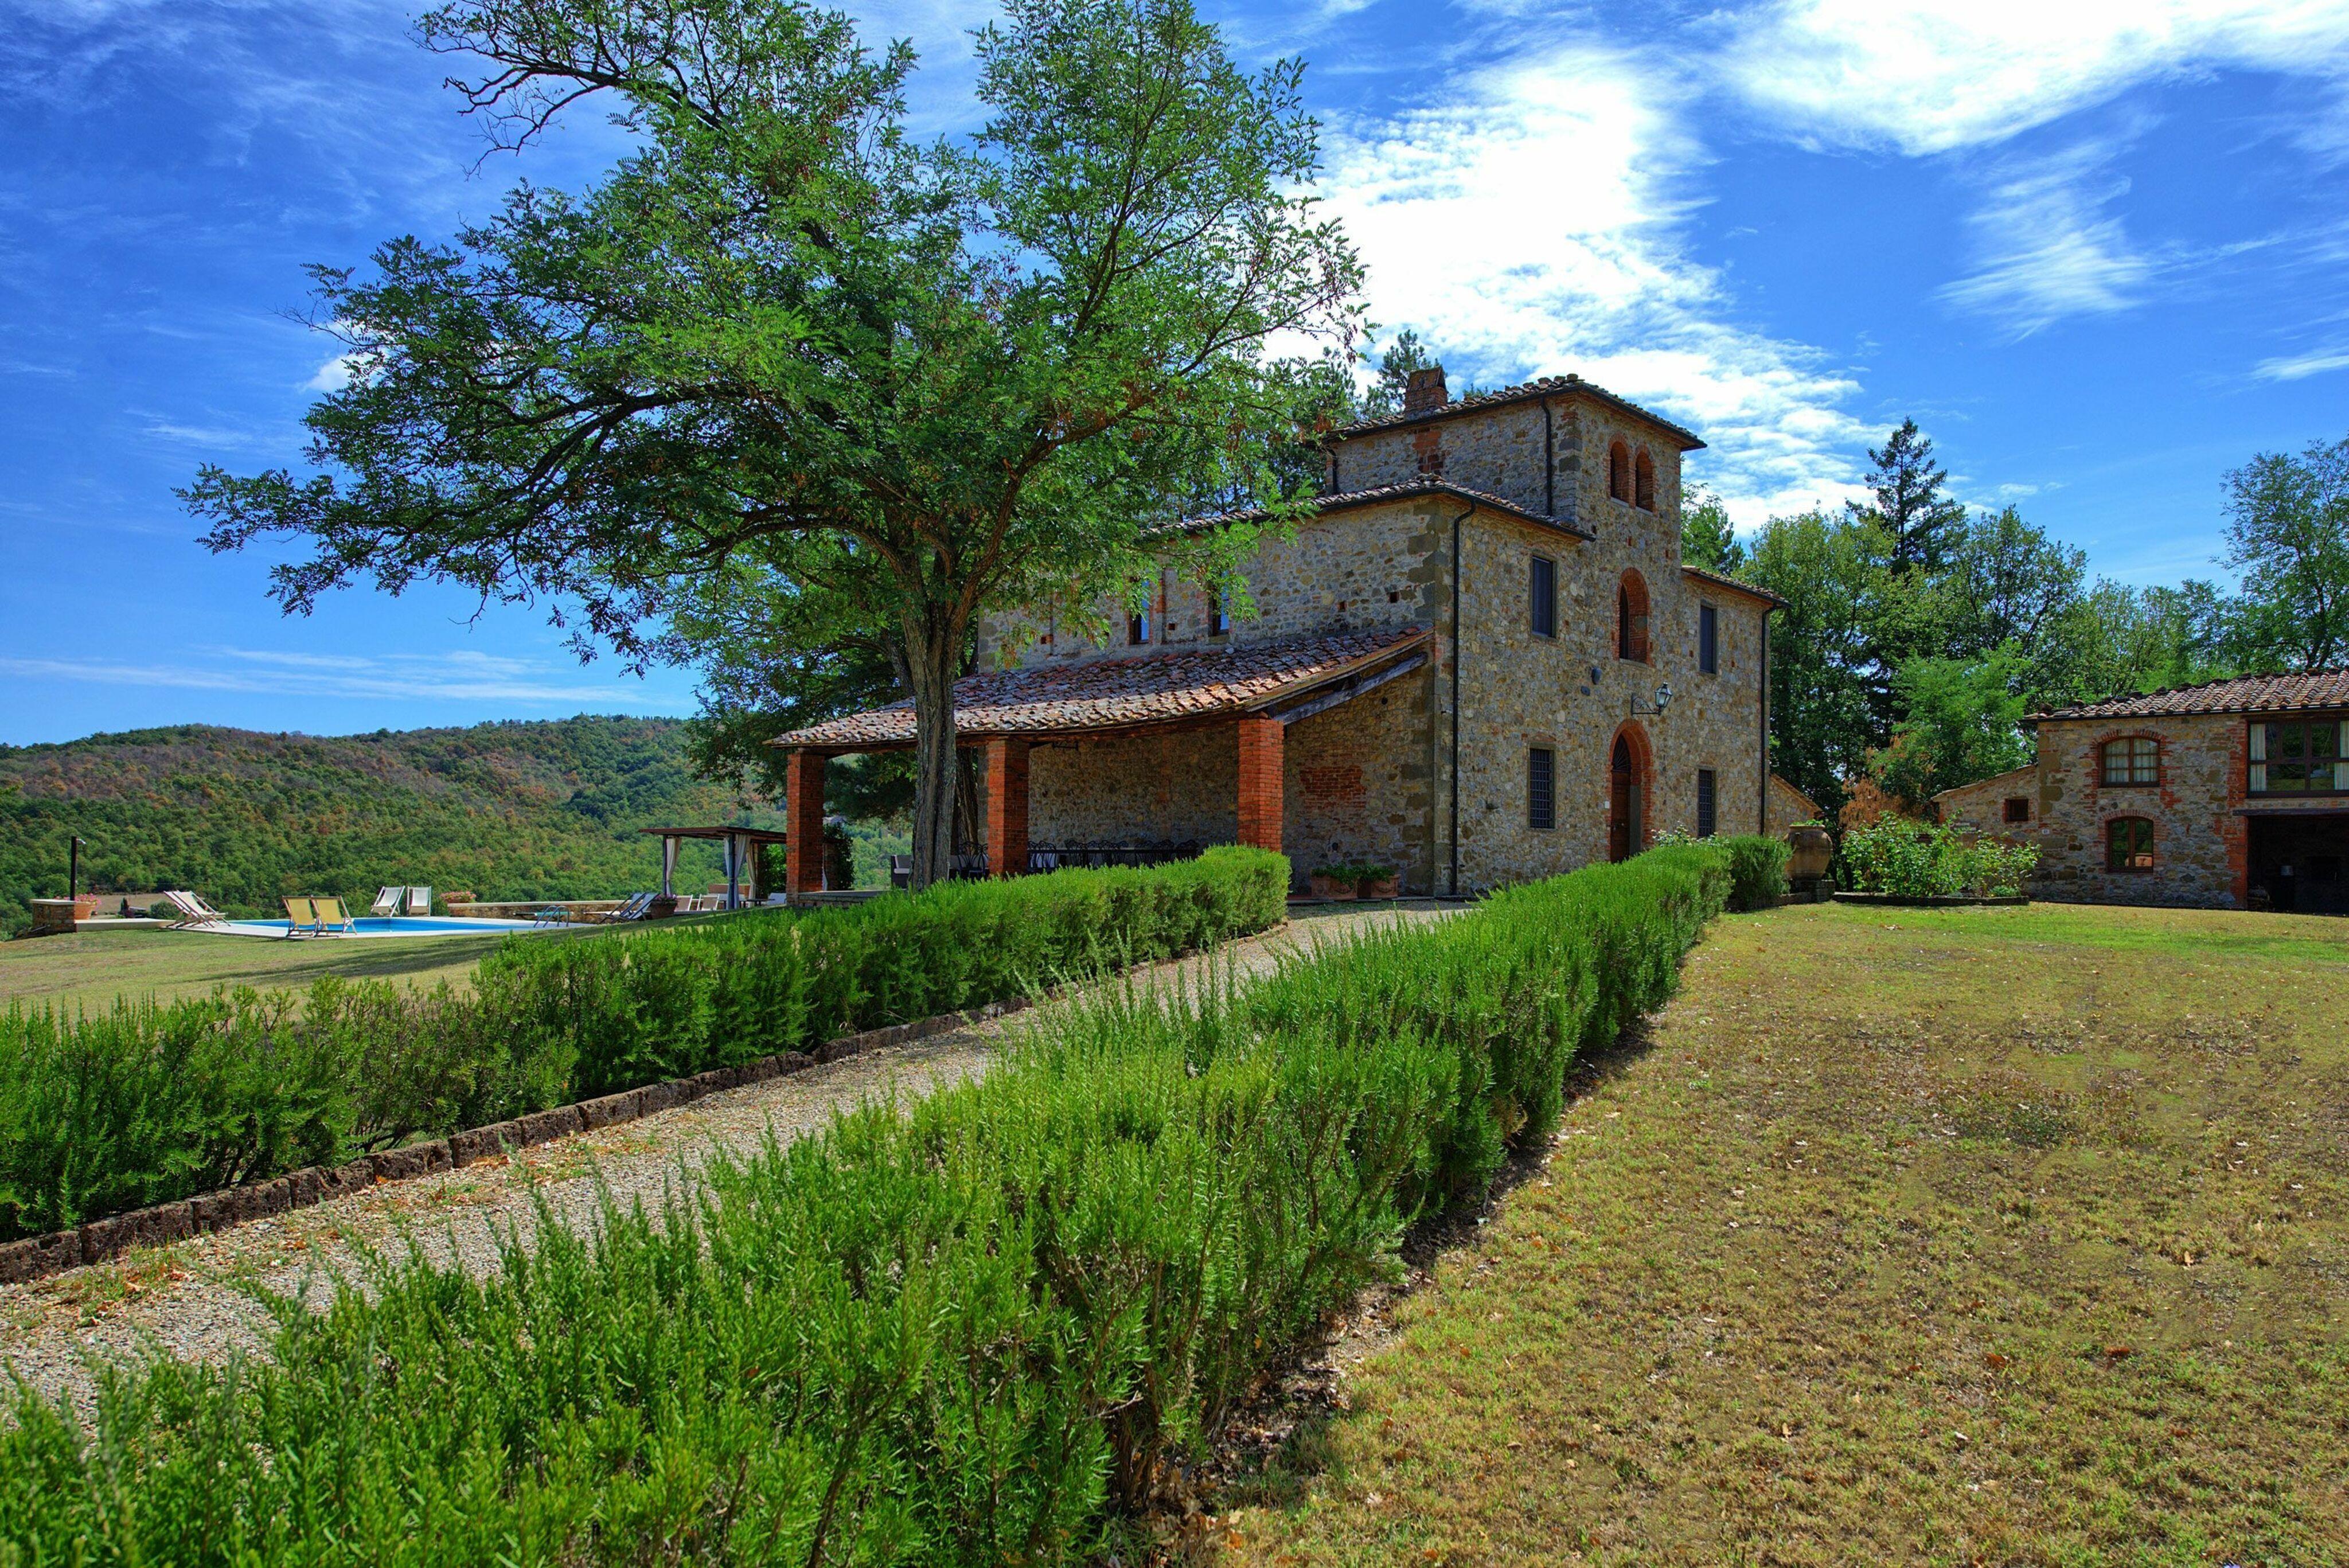 Villa Fabbriimage 47